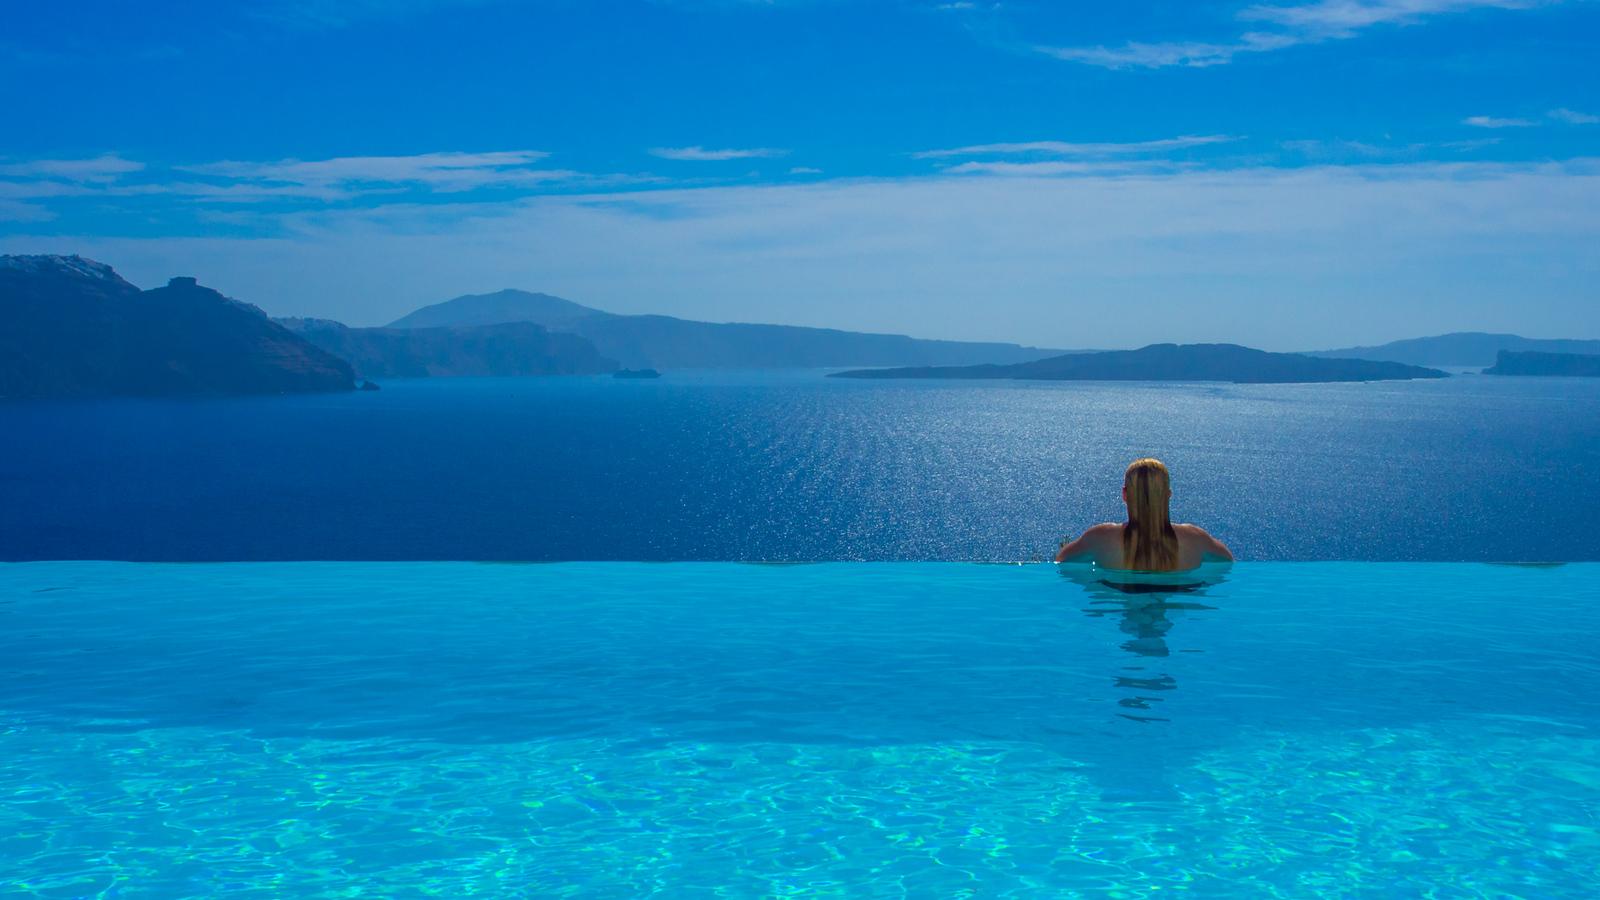 Enjoying the view in Santorini.